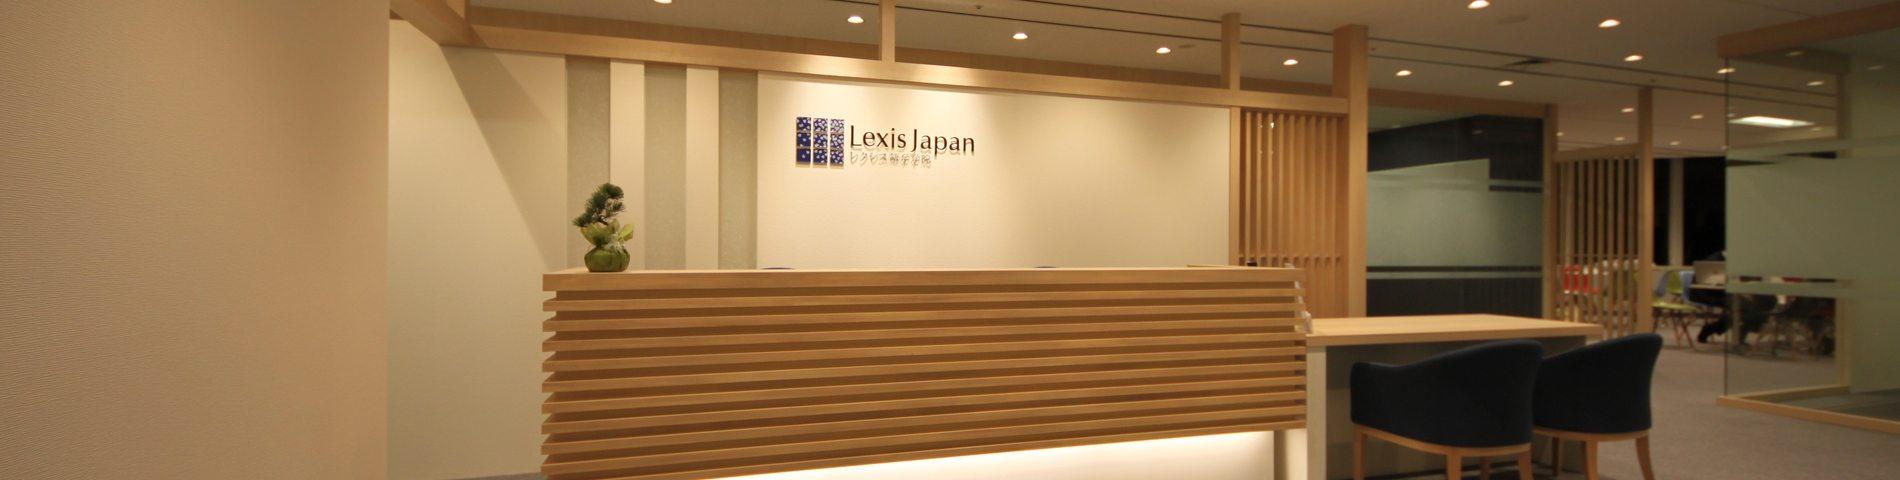 Lexis Japan foto 1